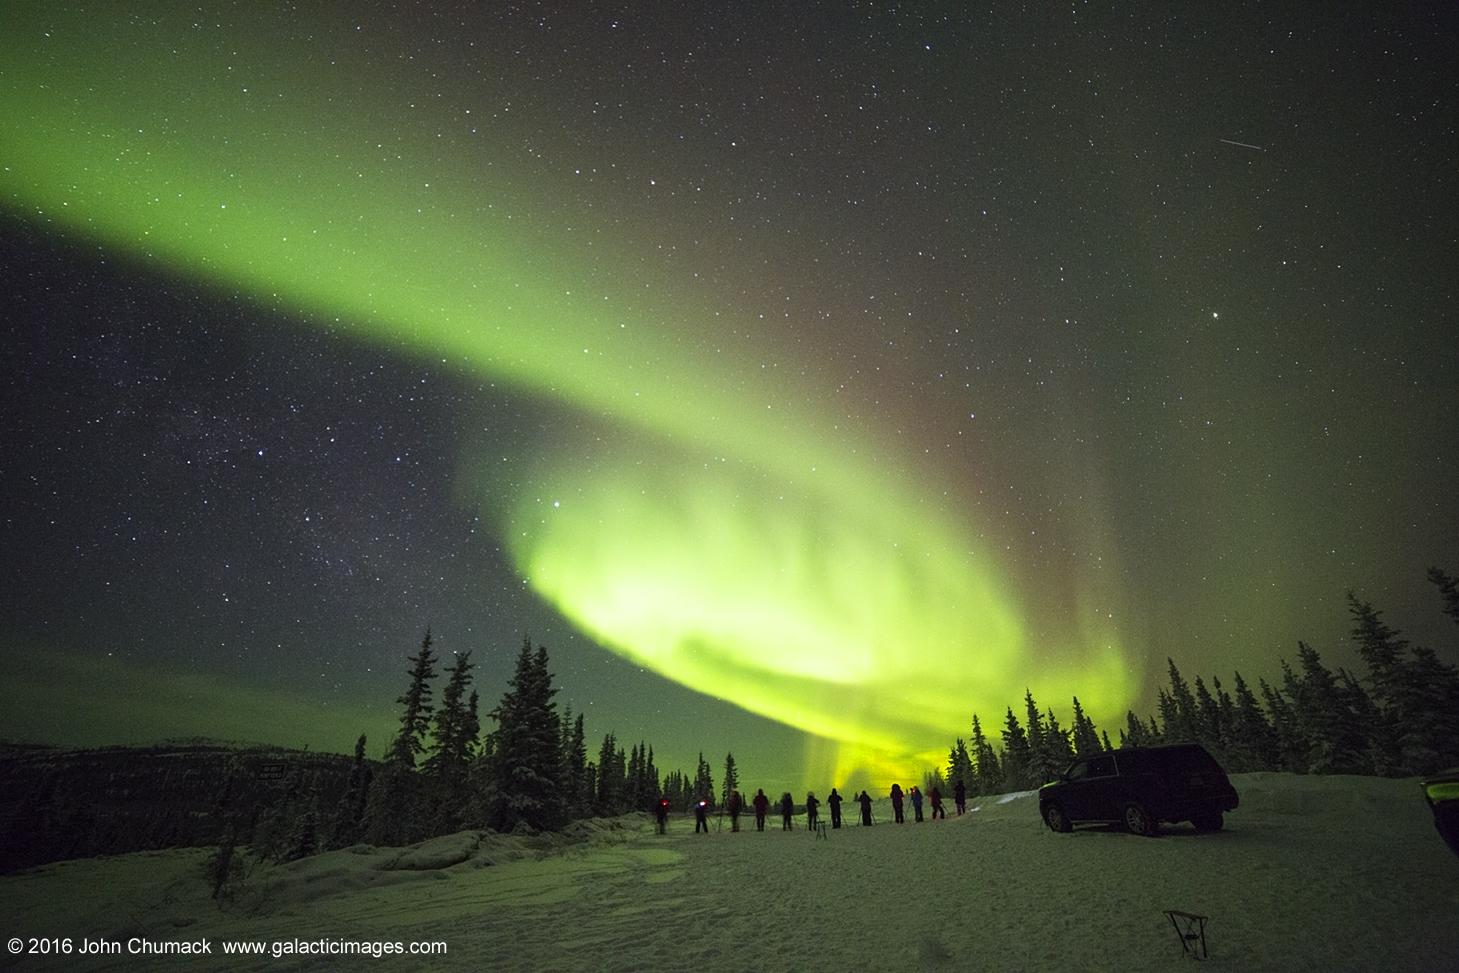 Alaskan Aurora Mimics Spiral Galaxy in Spectacular Skywatcher Photo